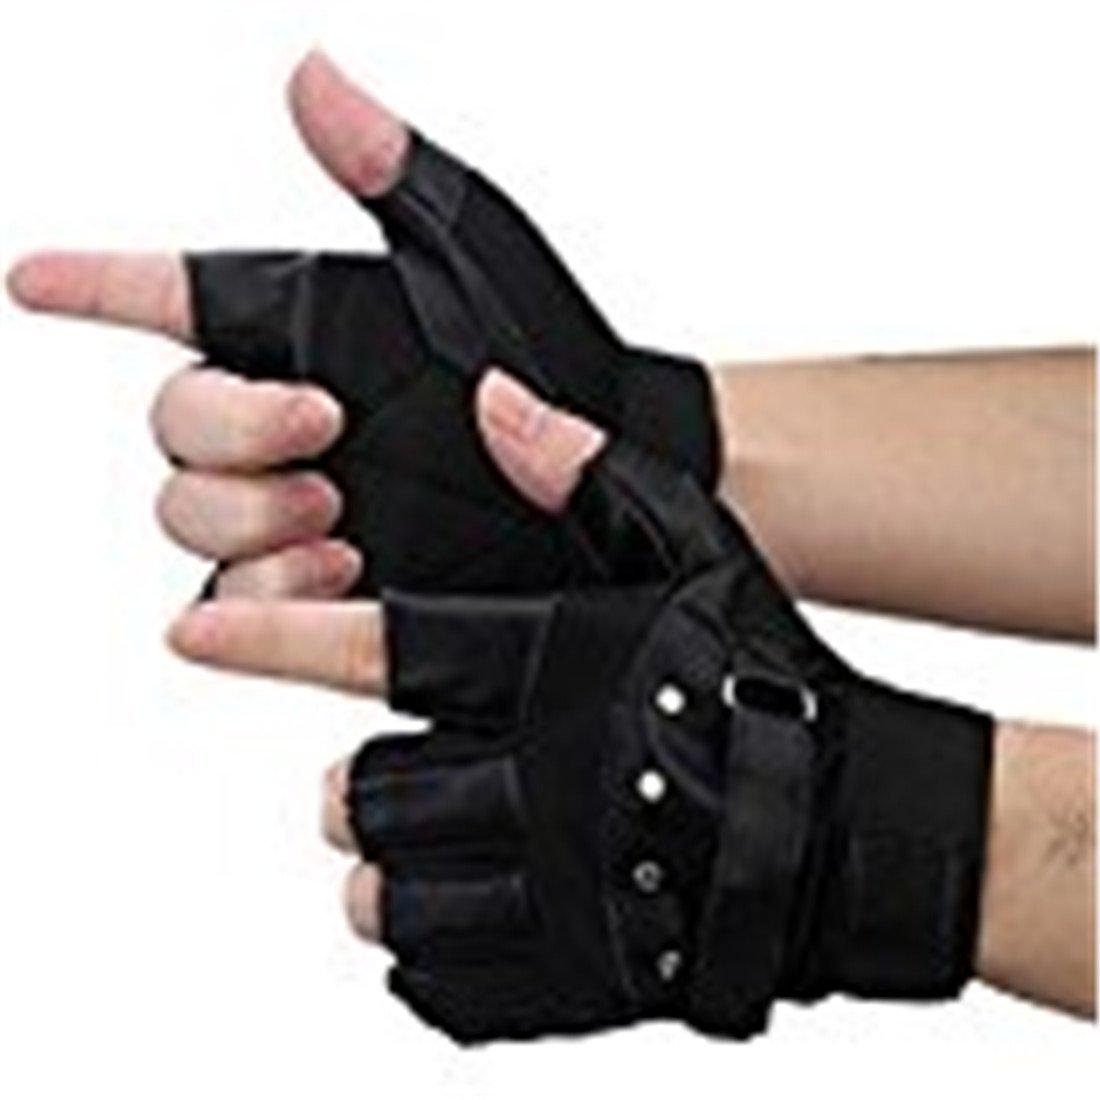 Men's Sports Leather Gloves,Hemlock Soft Driving Motorcycle Biker Fingerless Warm Gloves (Black)